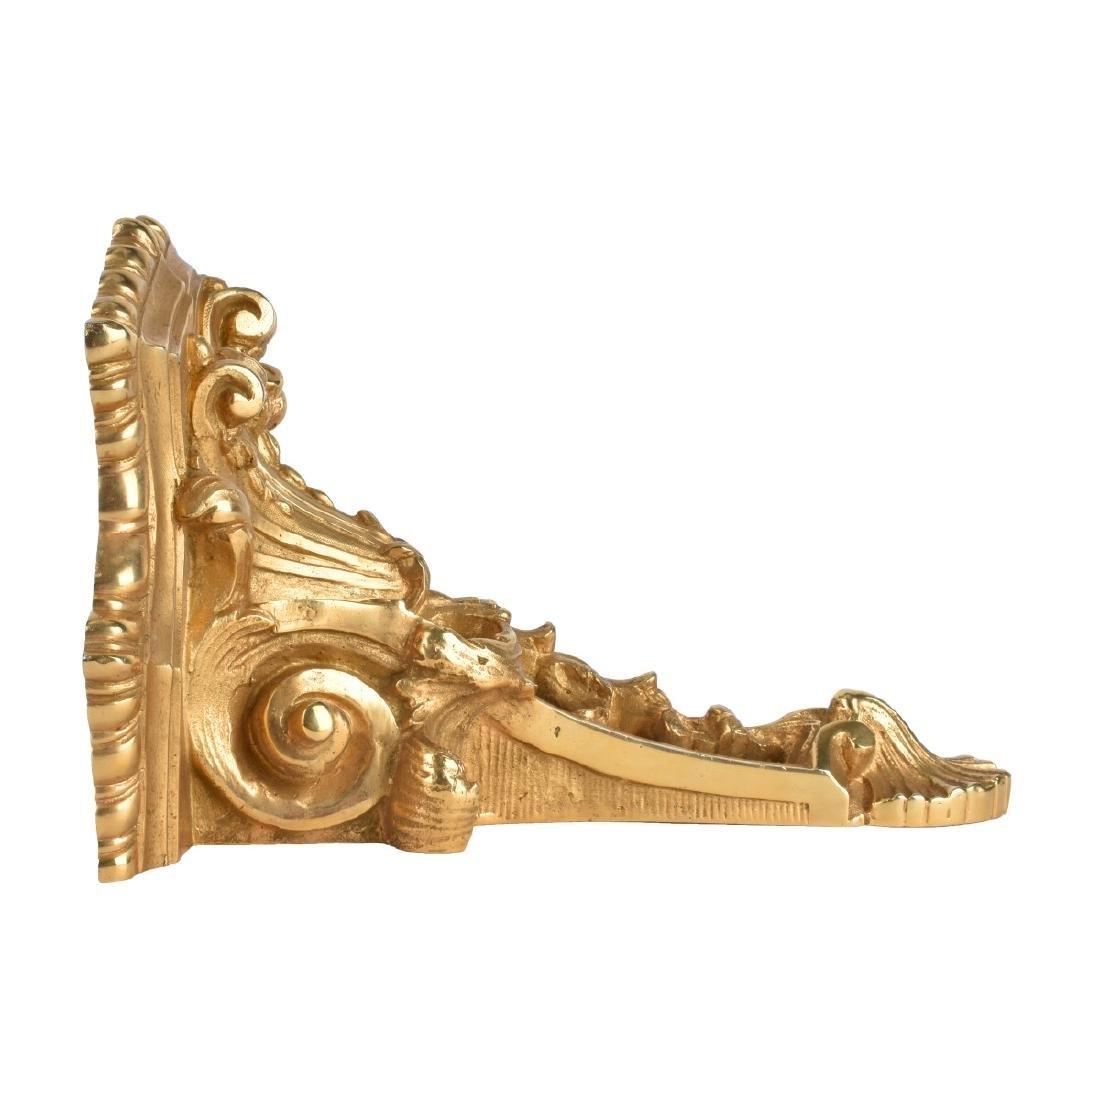 20th C. Louis XV Style Gilt Bronze Wall Bracket - 2